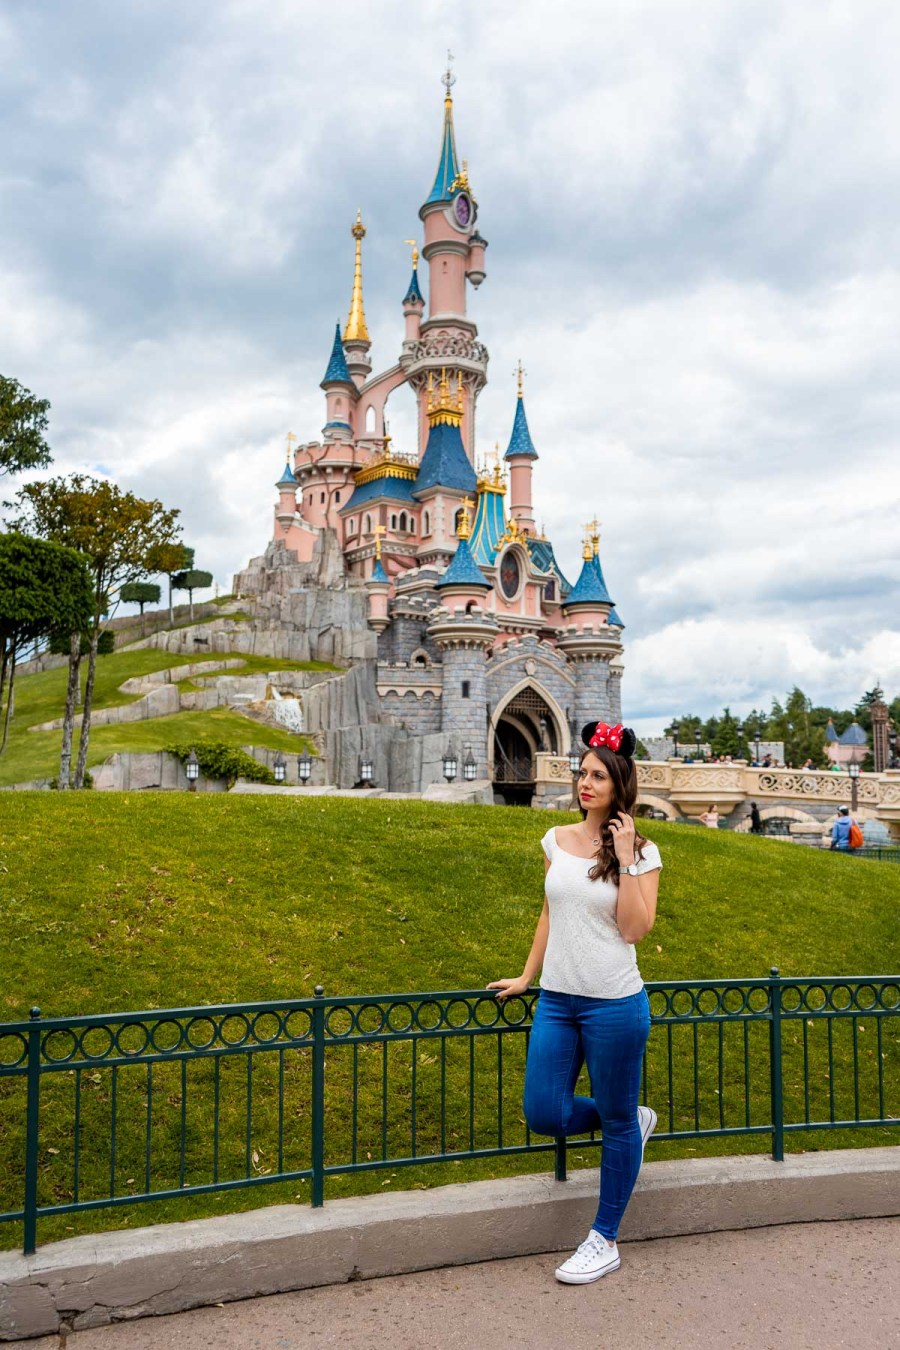 Girl standing in front of Sleeping Beauty's Castle in Disneyland Paris, which is one of the best Paris Instagram spots